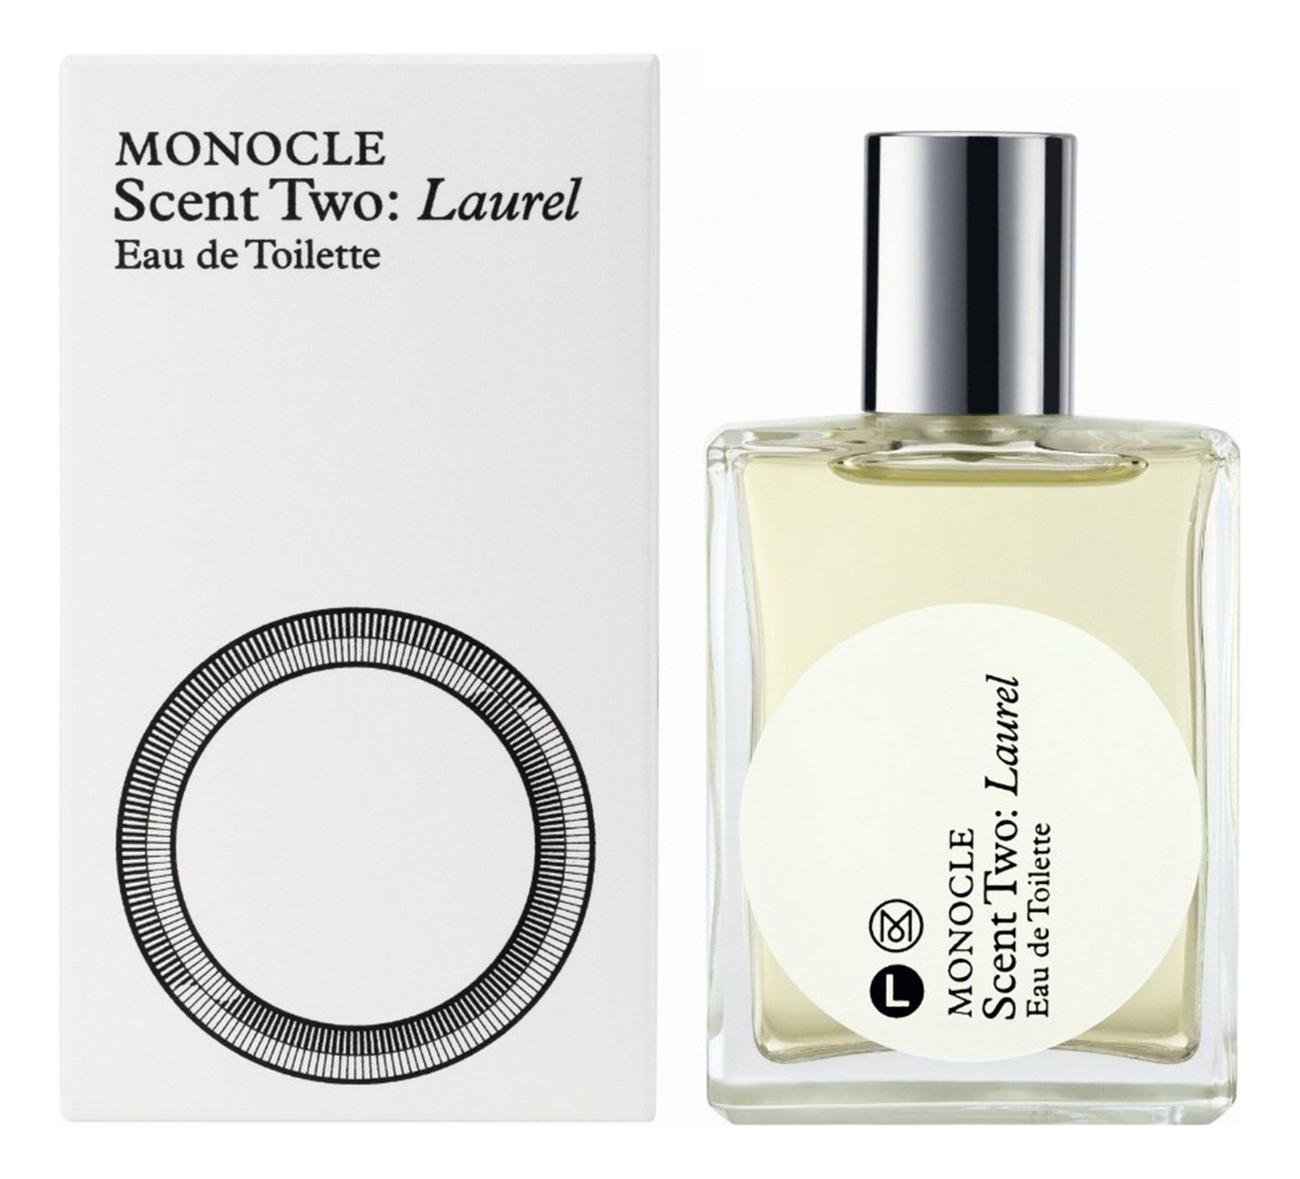 Купить Monocle Scent Two: Laurel: туалетная вода 50мл, Comme des Garcons